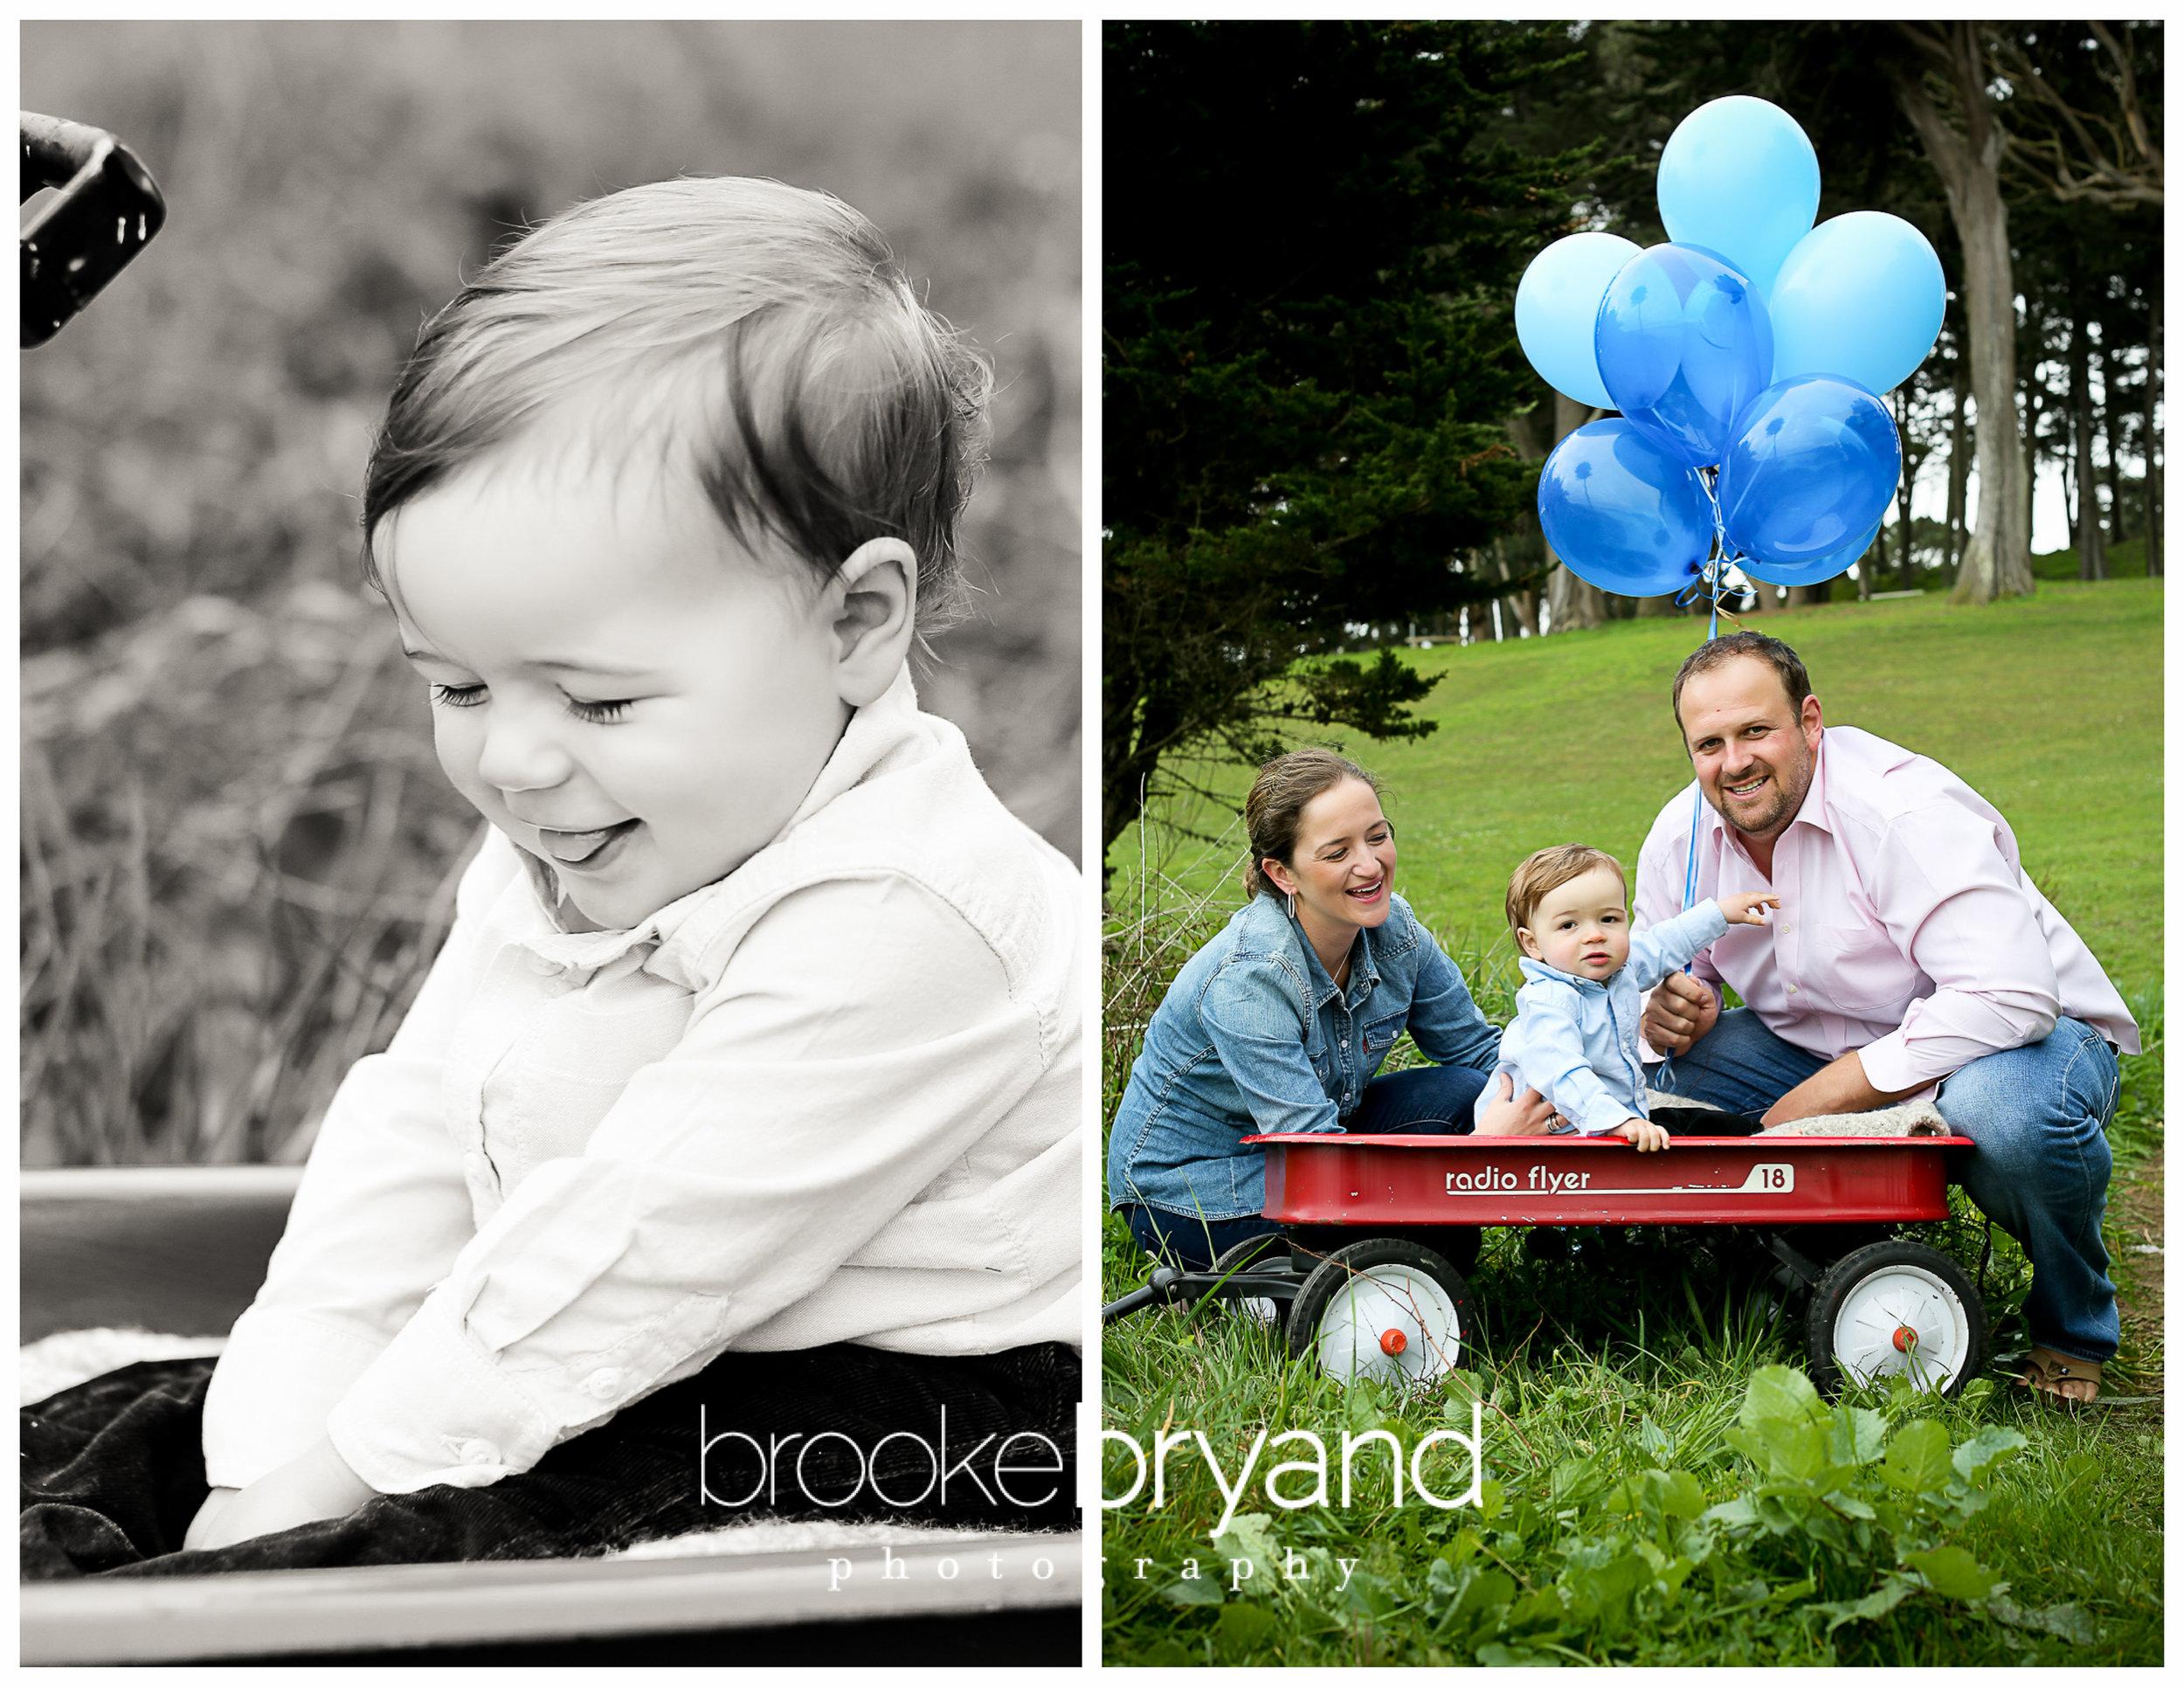 Brooke-Bryand-Photography-San-Francisco-Family-Photographer-Lands-End-Photos-and-China-Beach-Photos-2-up-elder-3.jpg